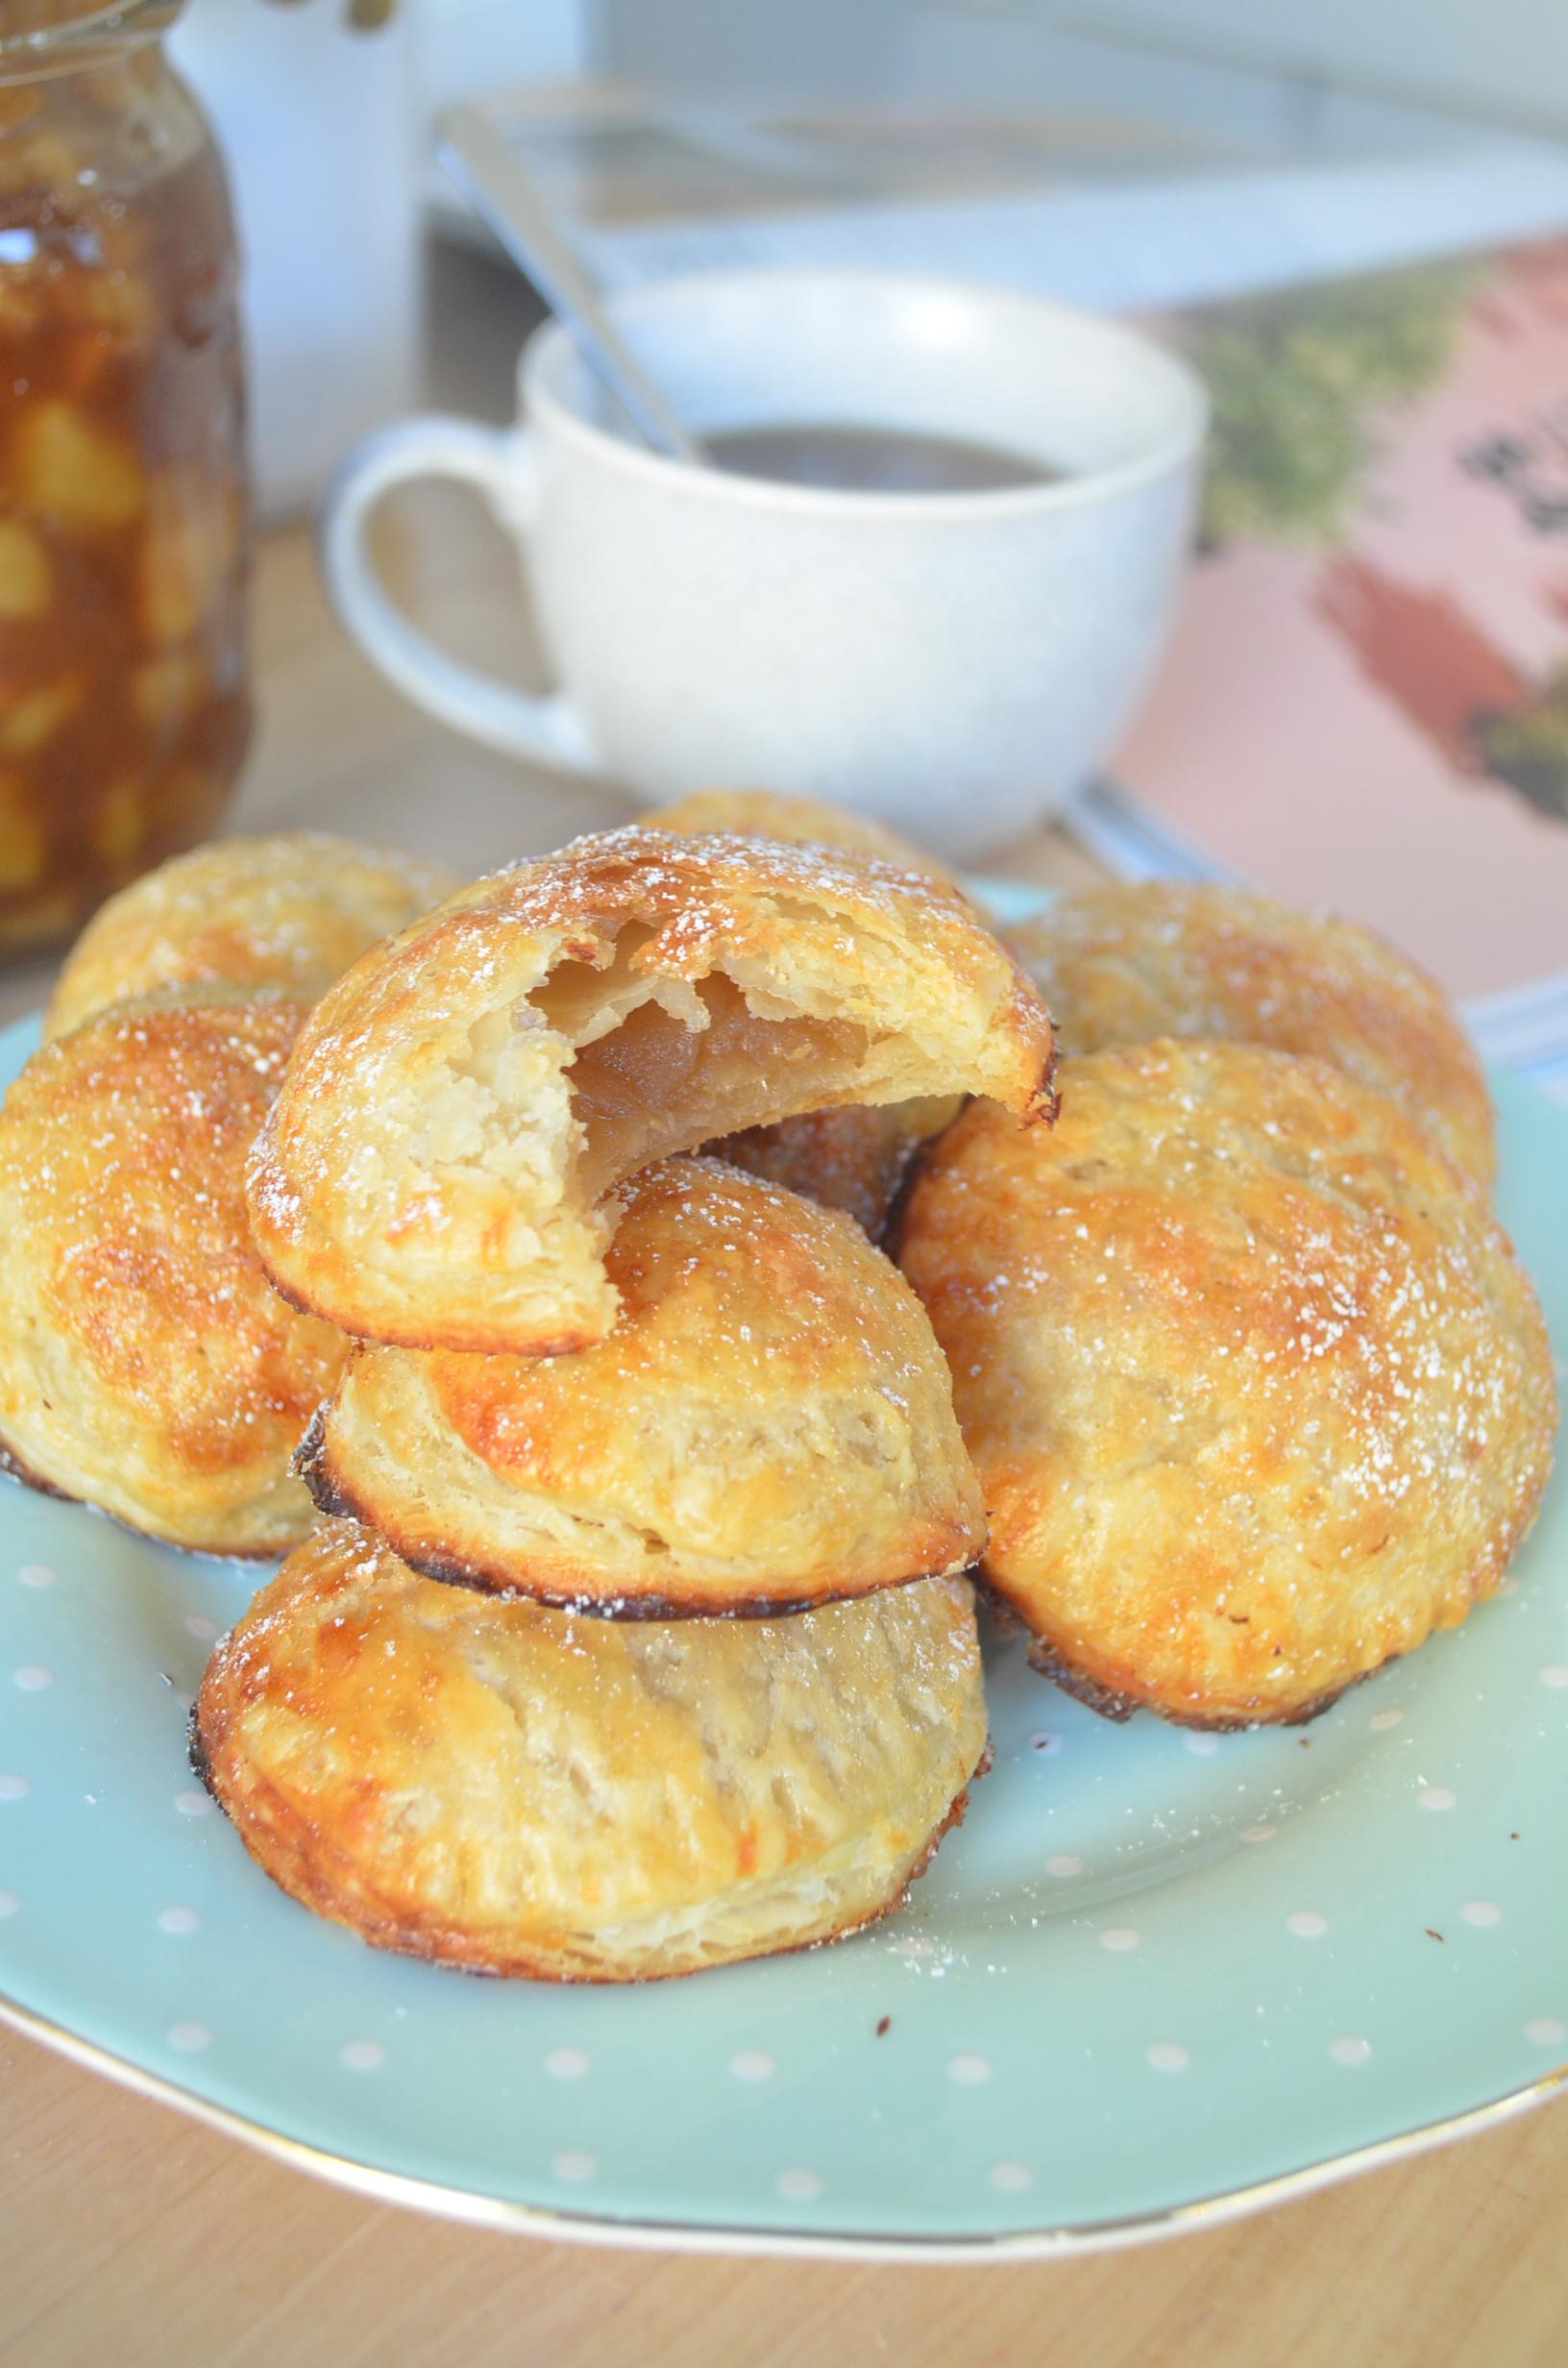 Homemade Apple Hand Pie